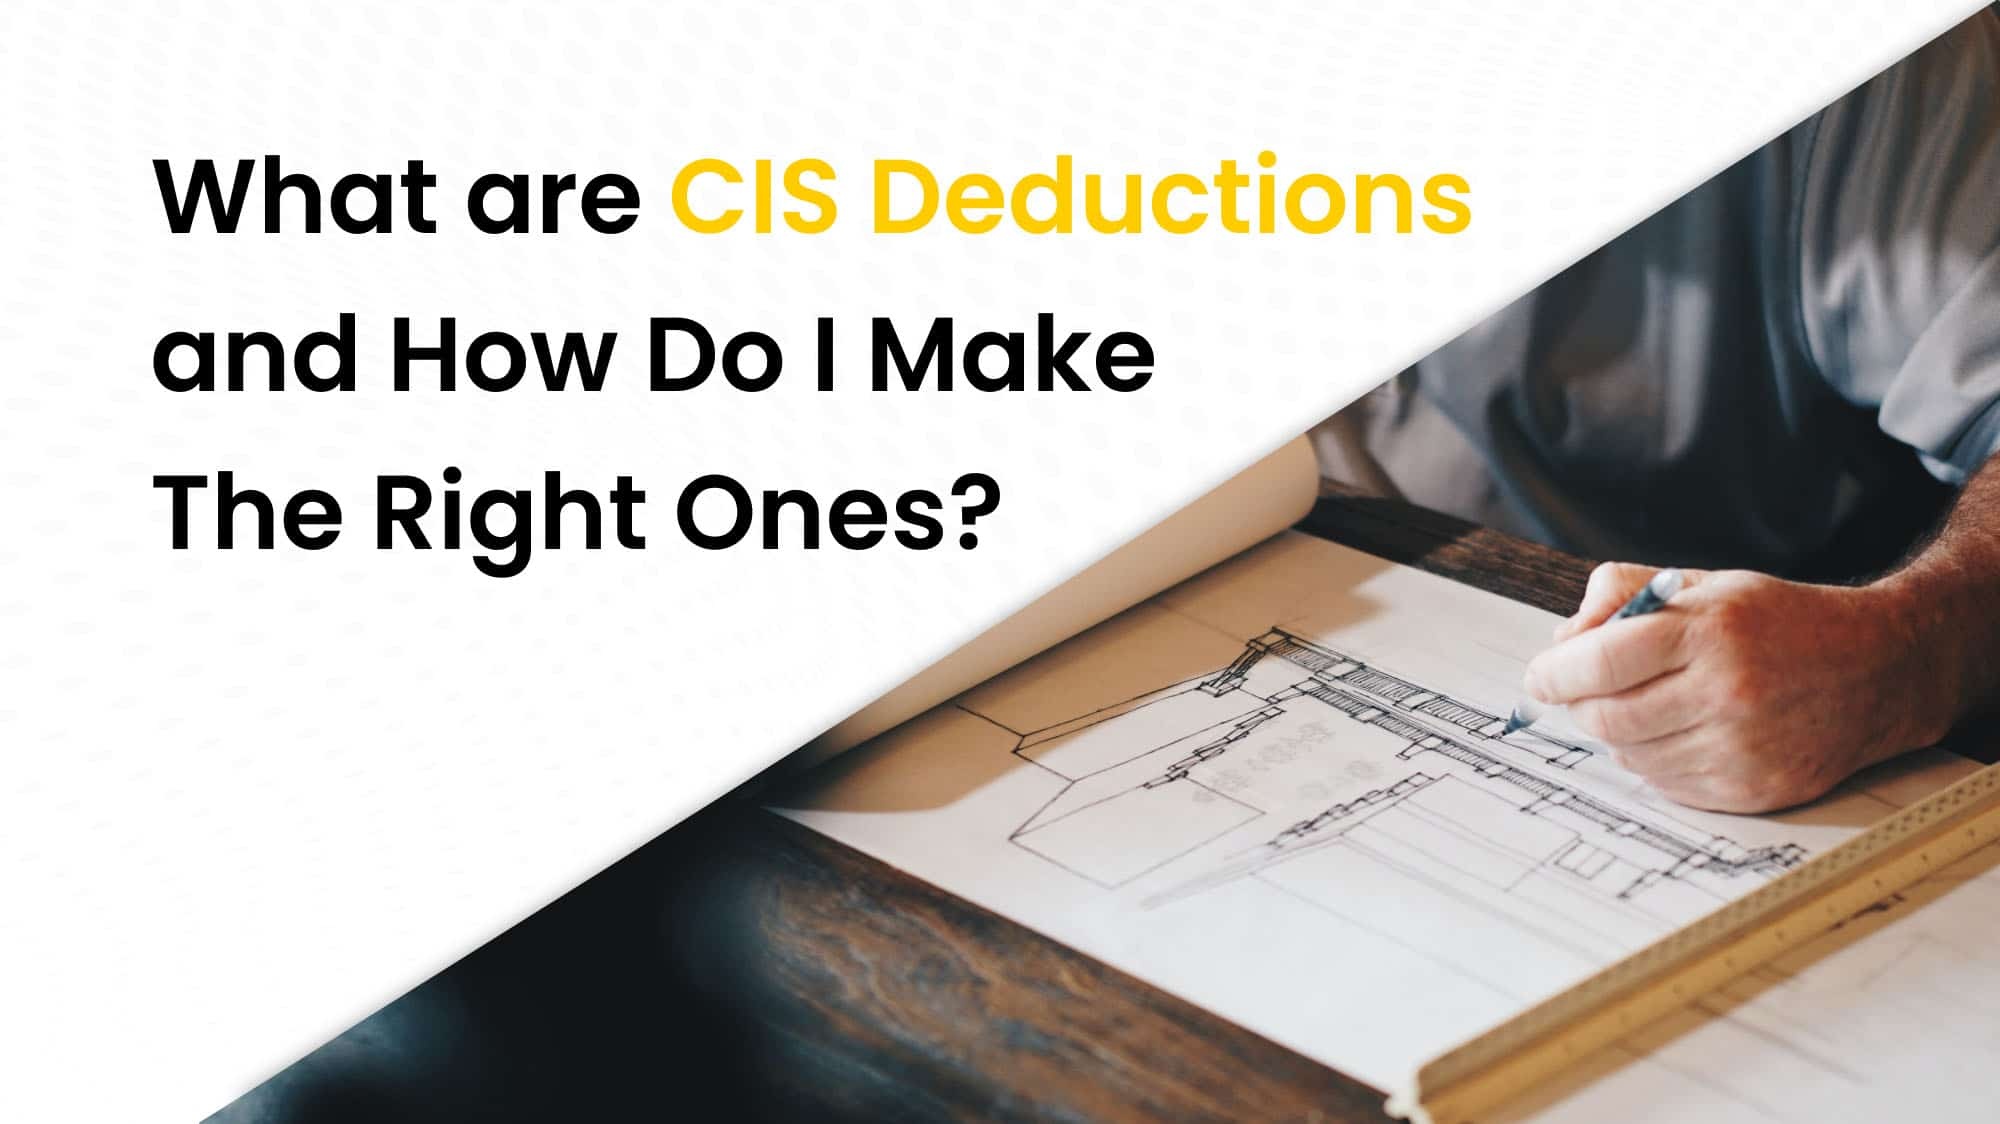 CIS Deductions